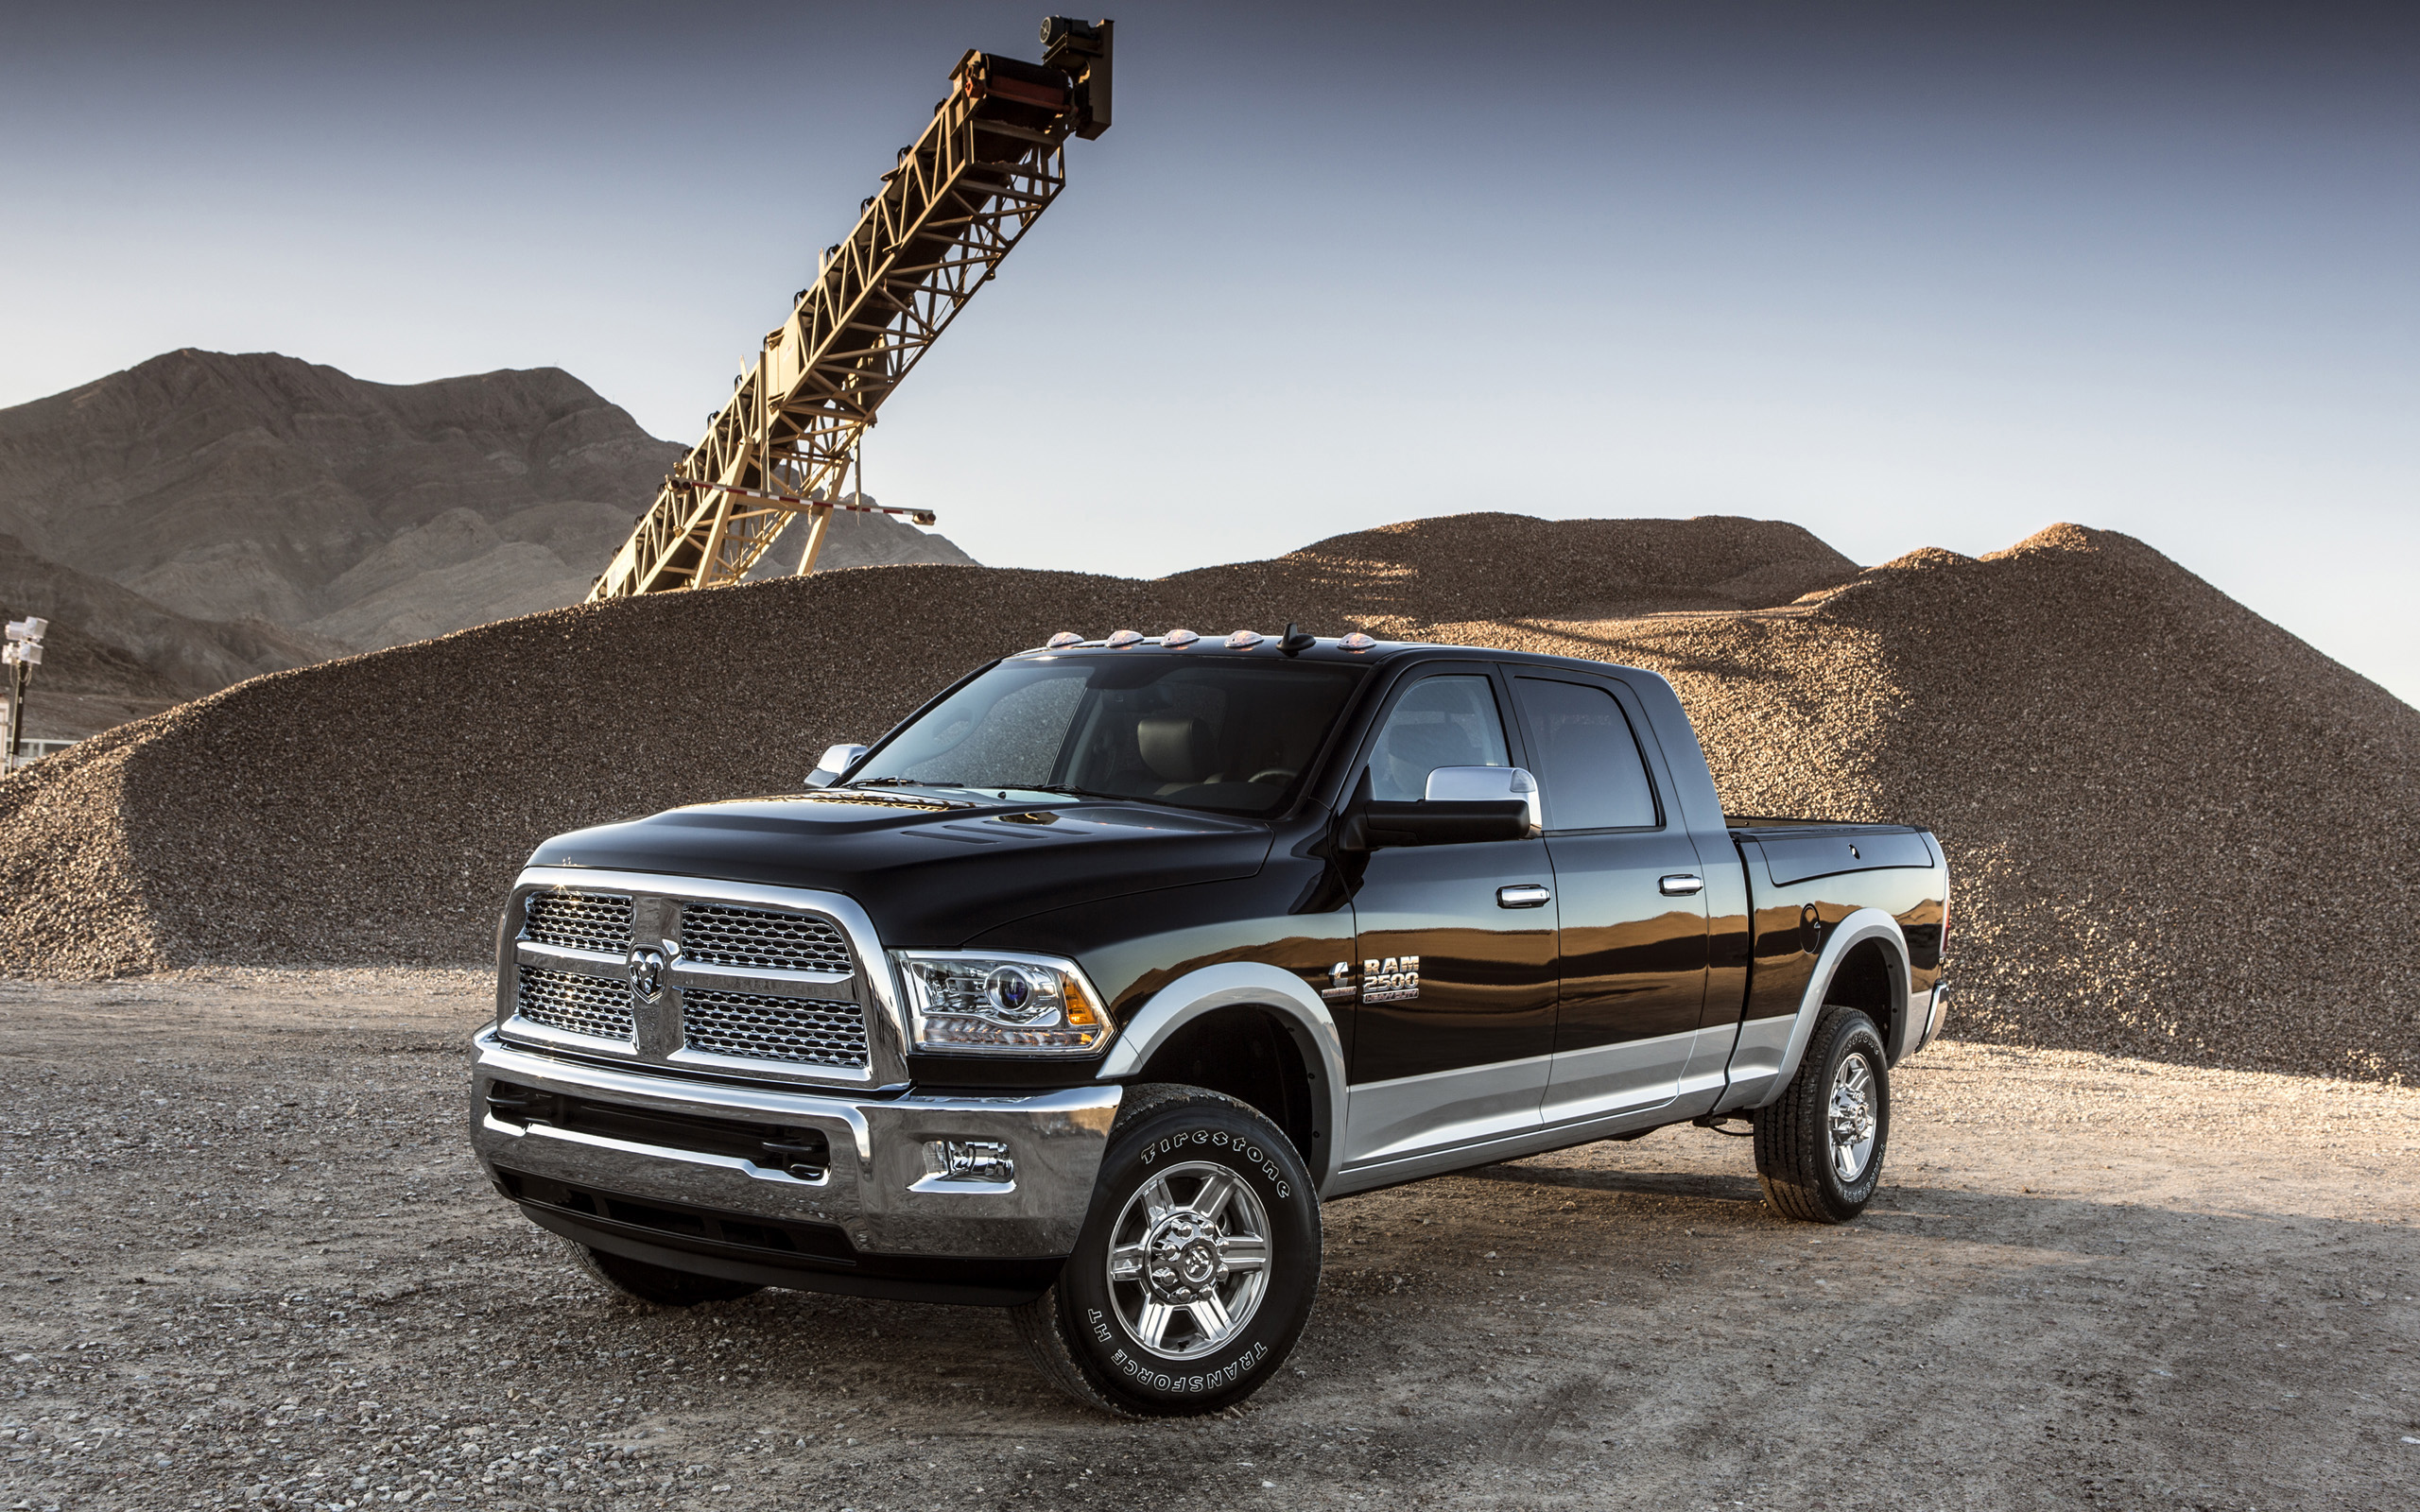 2013 Dodge Ram 2500 4x4 truck wallpaper background 2560x1600